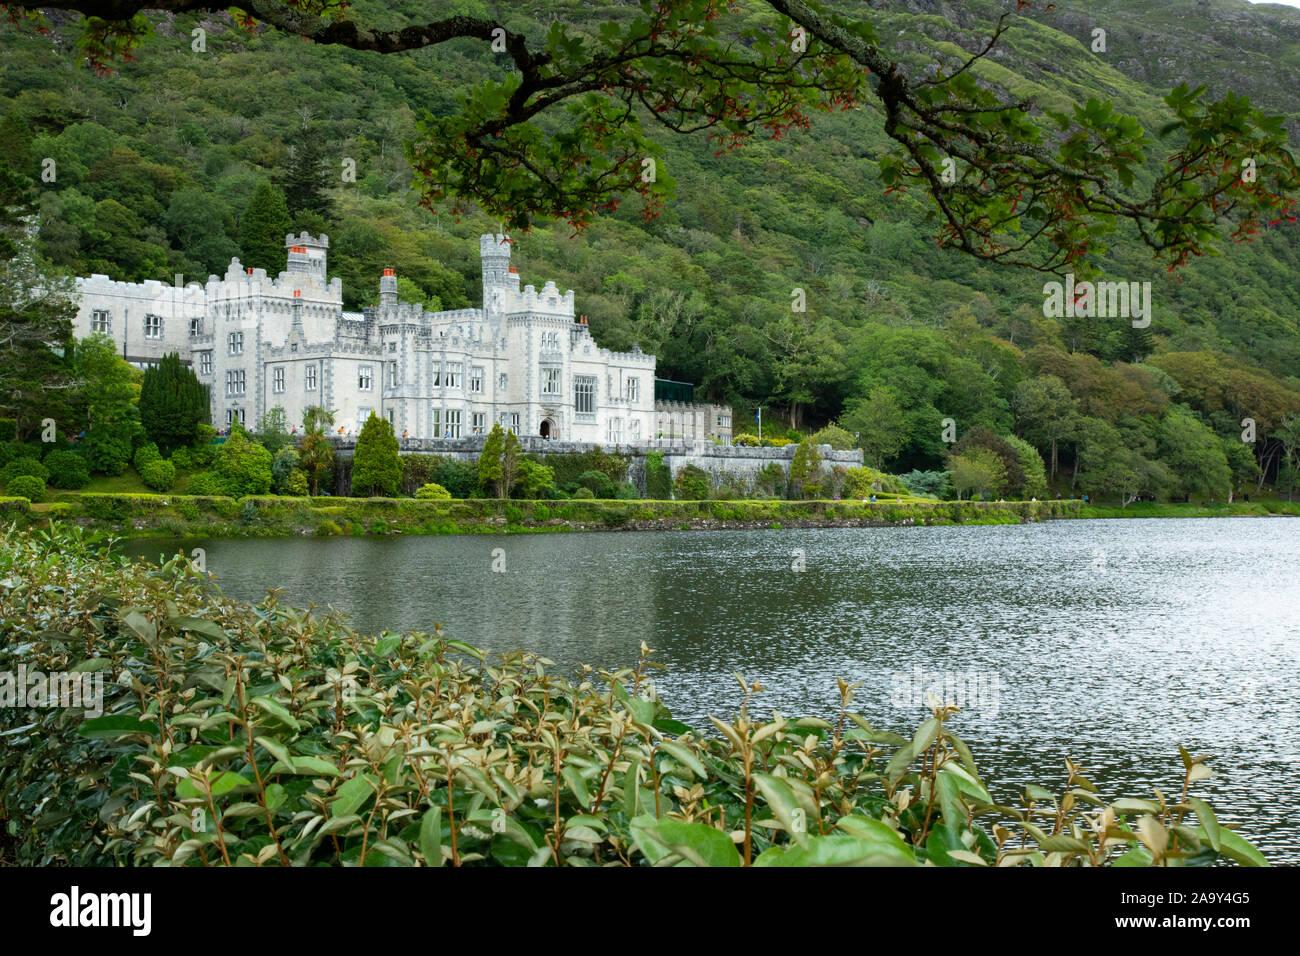 Kylemore Abbey, and lake. Connemara region, Ireland Stock Photo